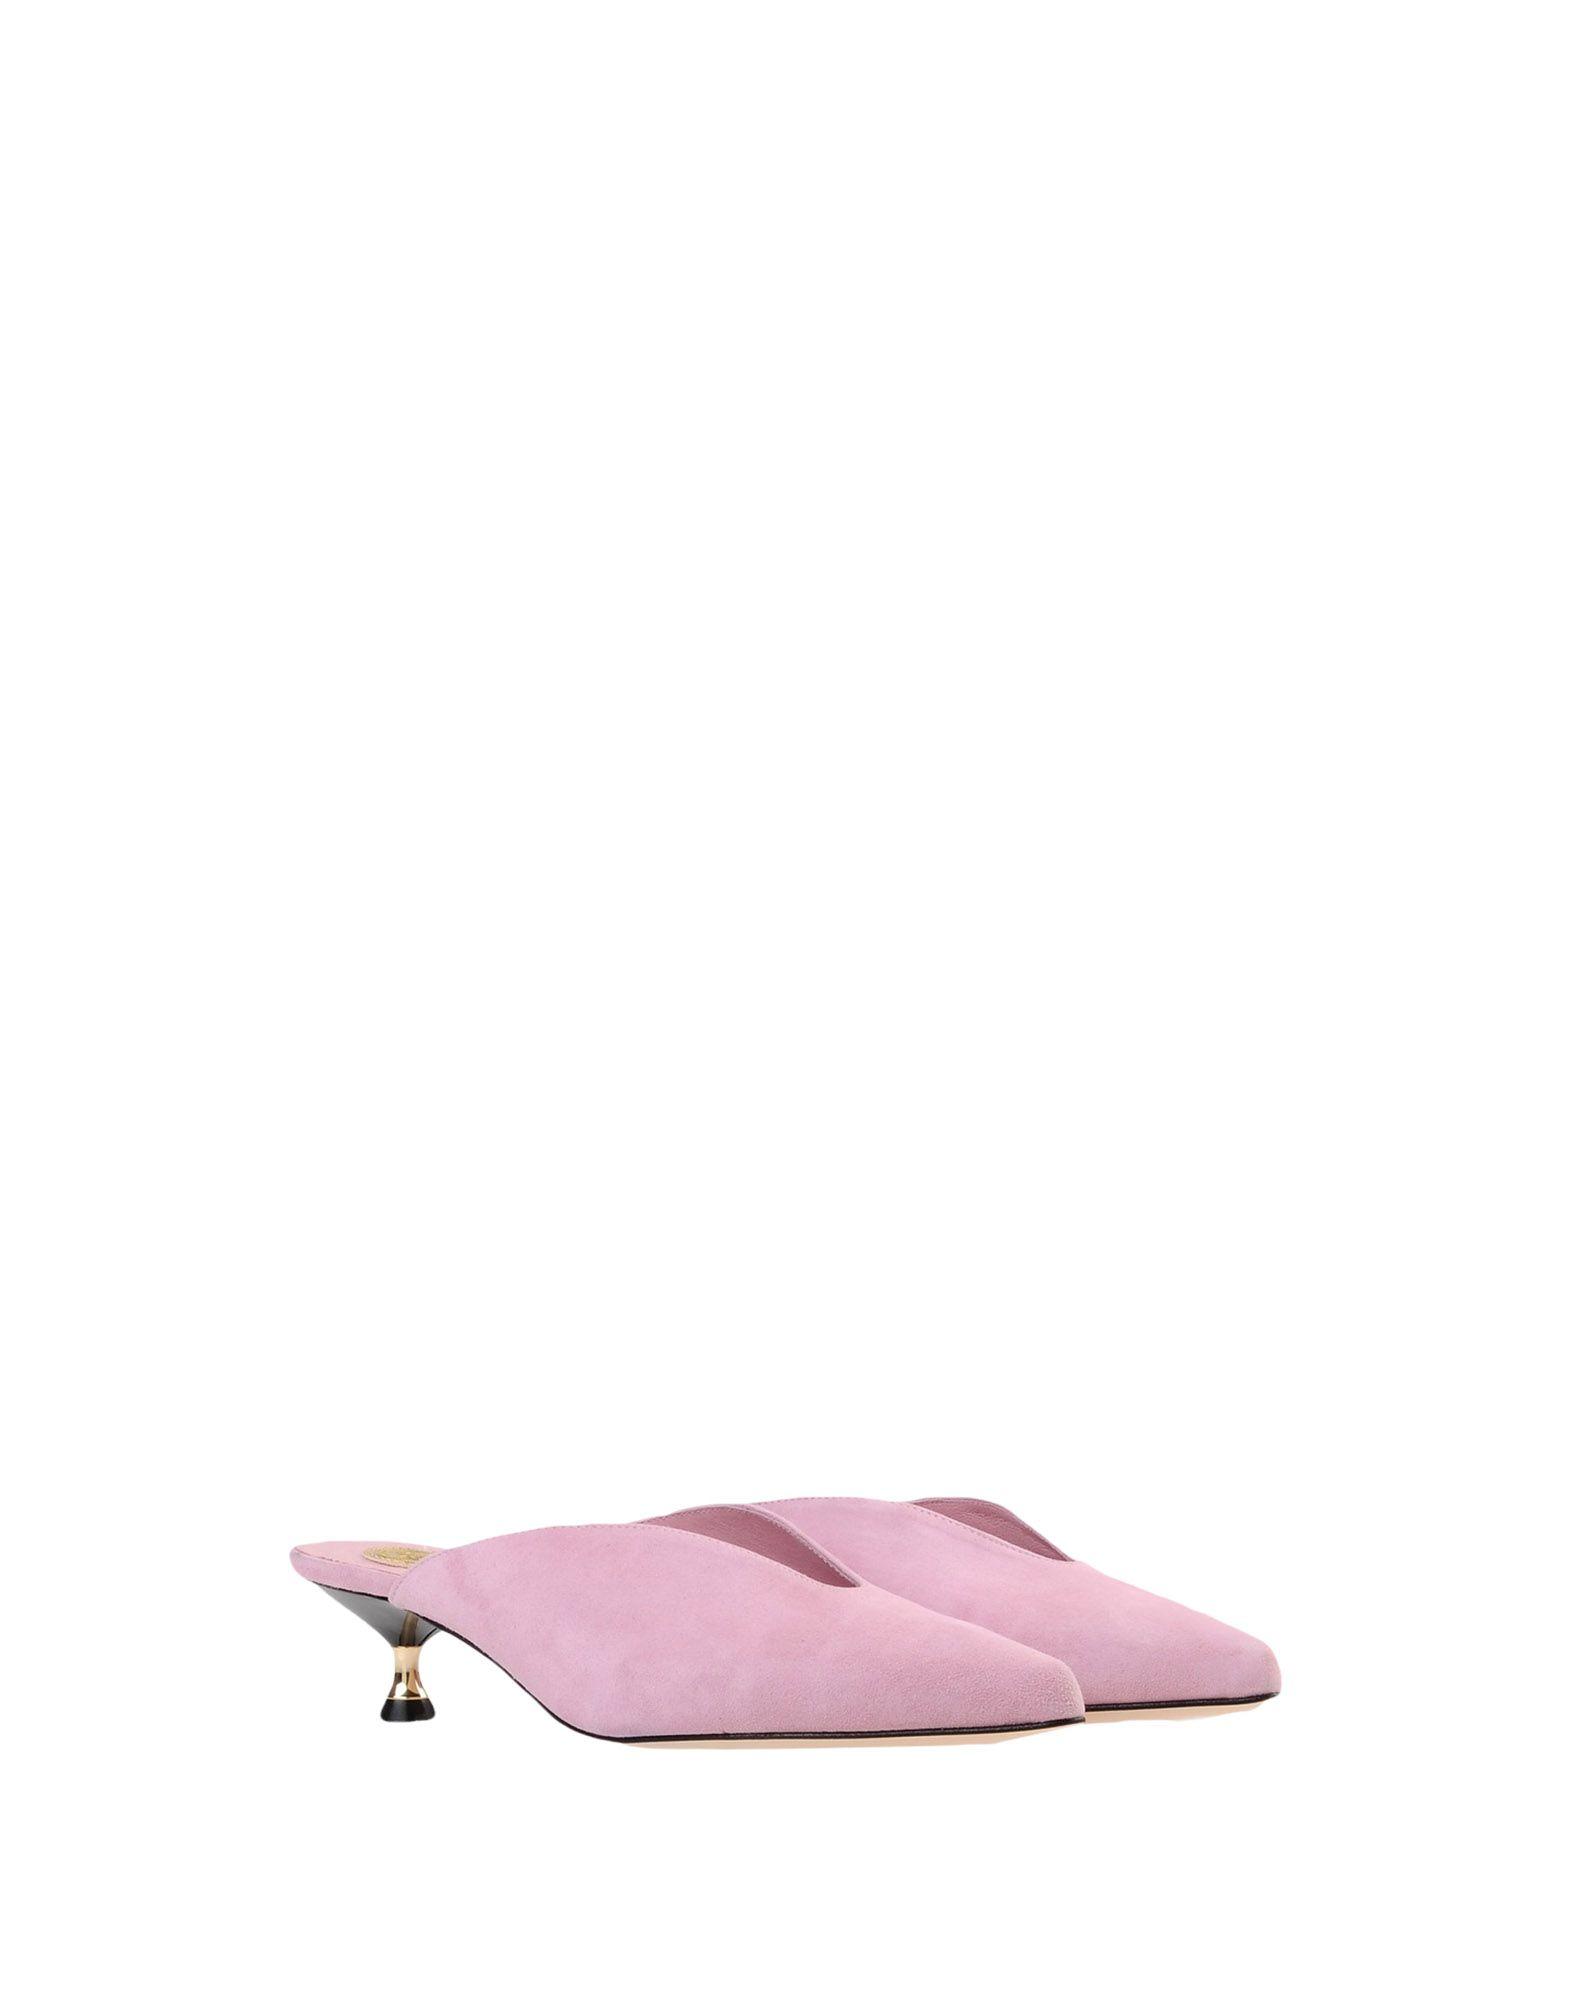 Stilvolle Shoeshibar billige Schuhe Maison Shoeshibar Stilvolle Pantoletten Damen  11470846DJ bf7202